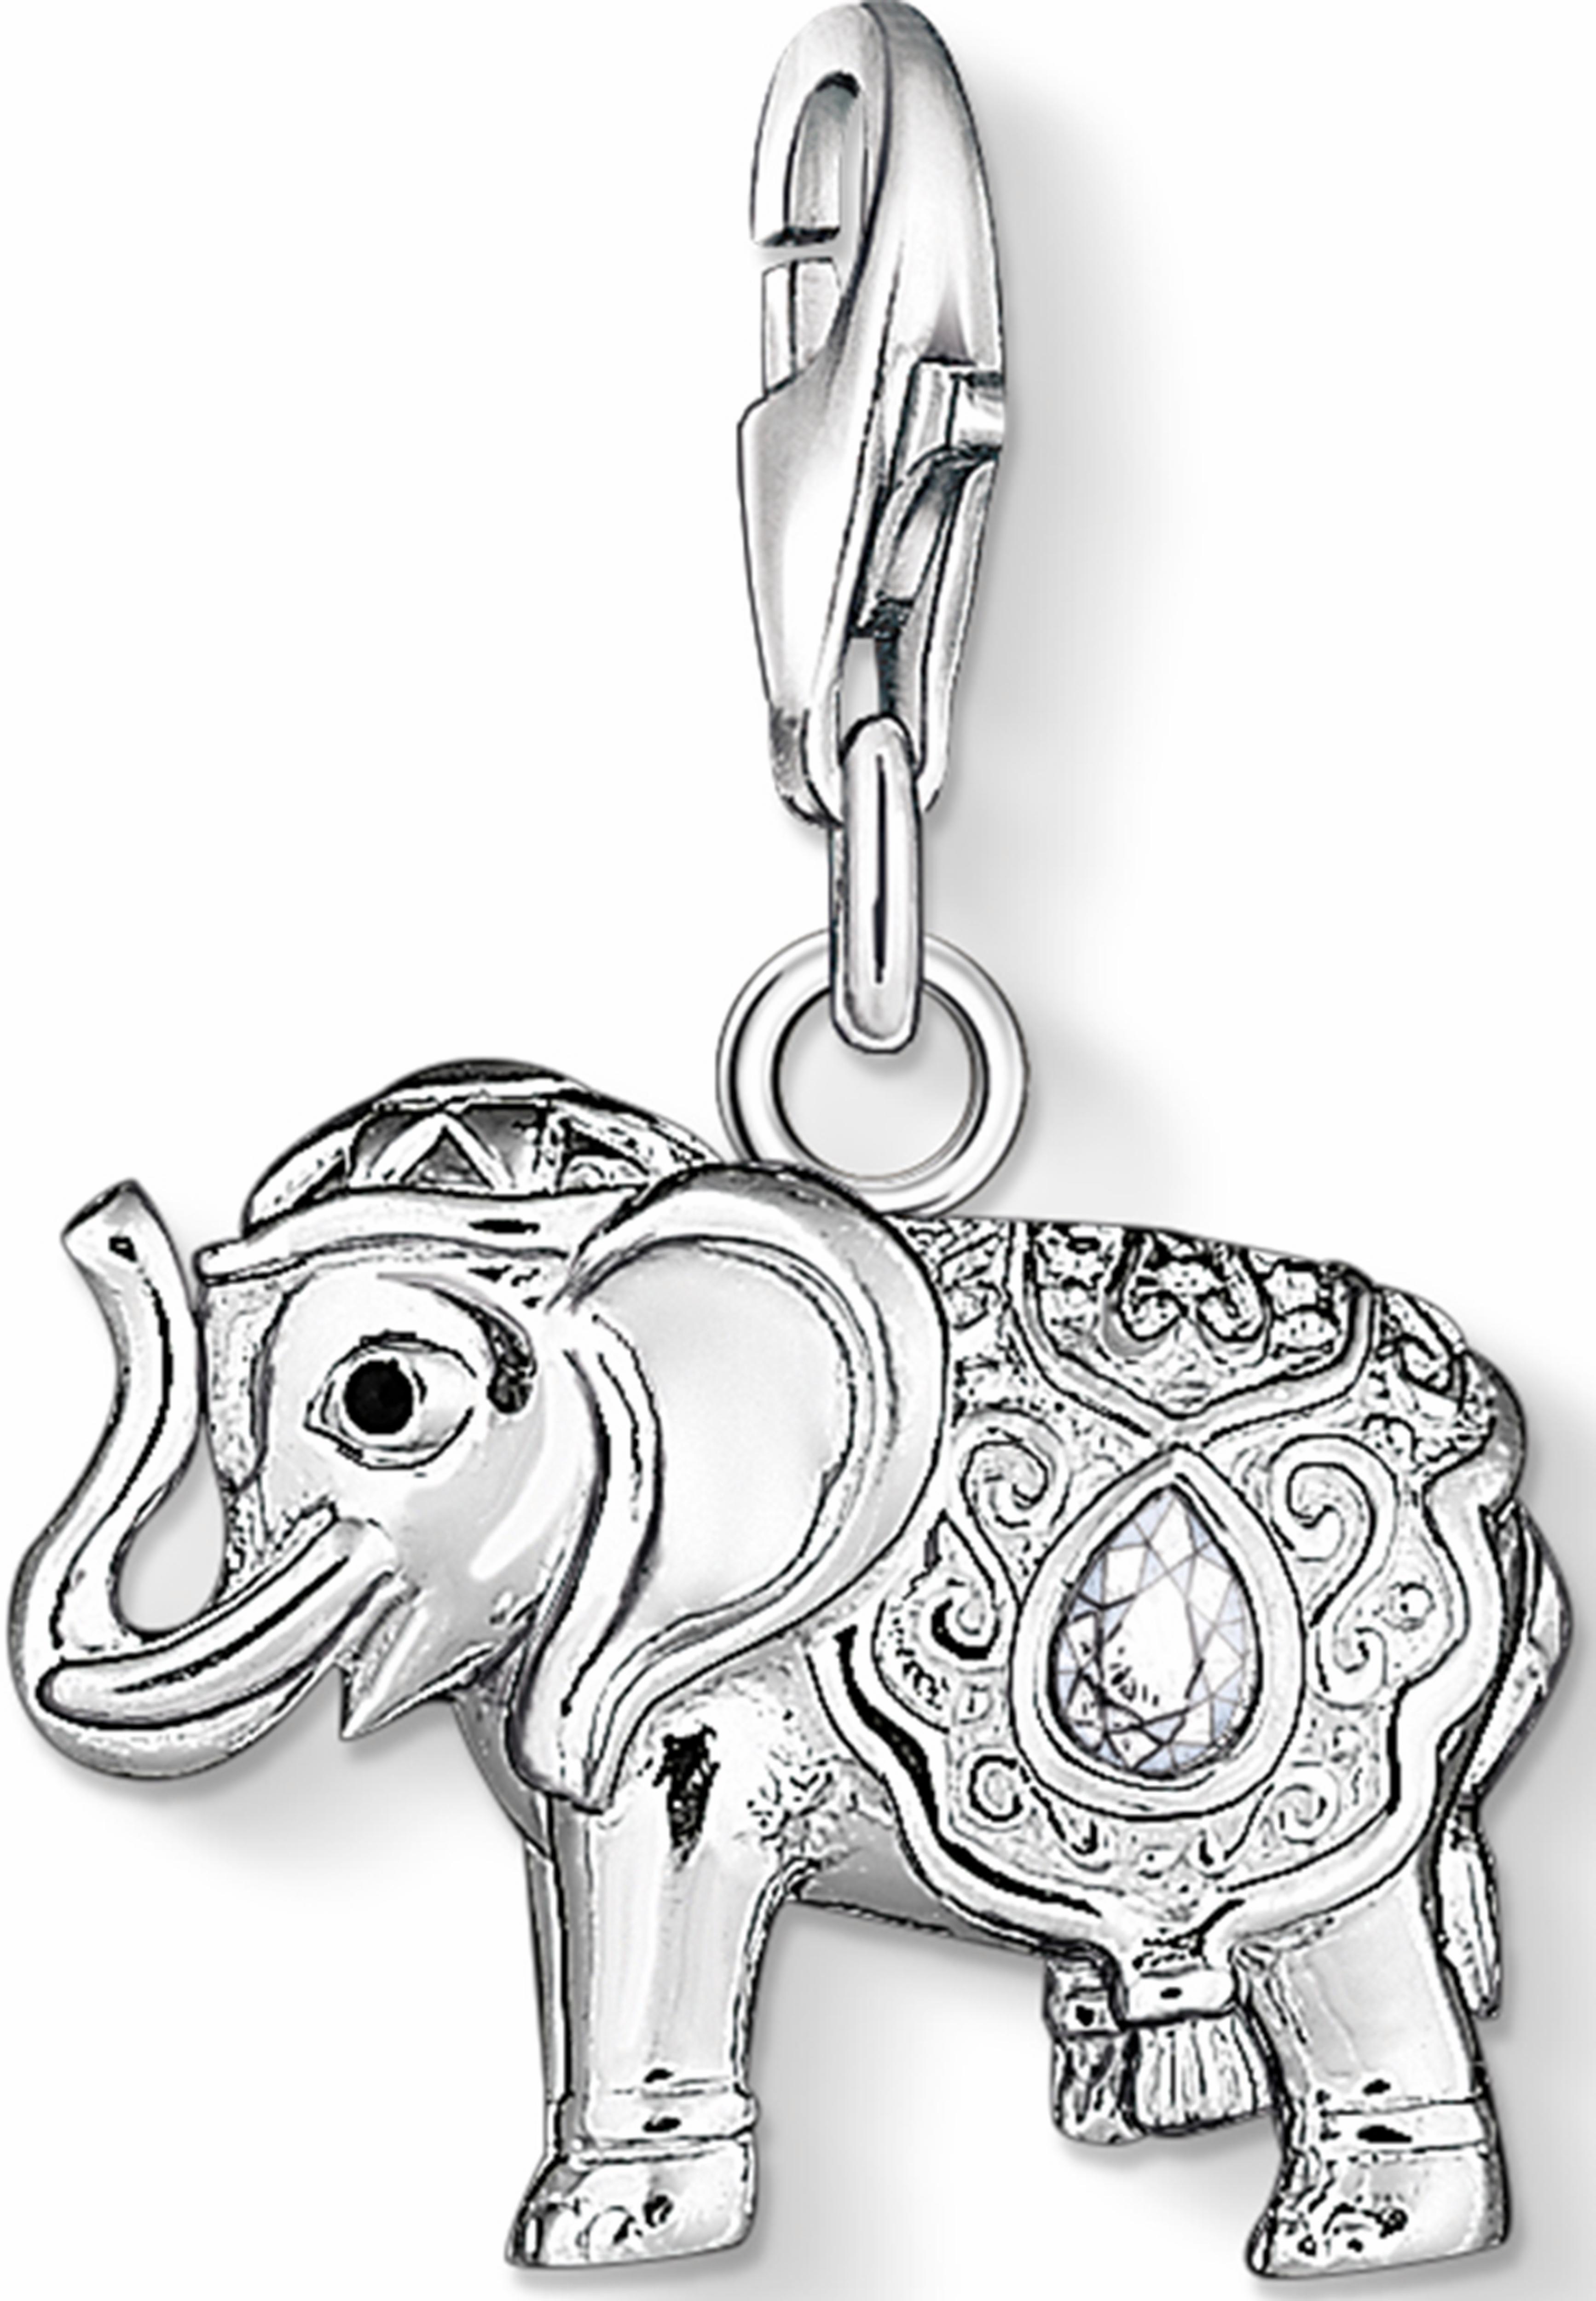 THOMAS SABO Charm-Einhänger Elefant 1050-041-14 | Schmuck > Charms | Thomas Sabo